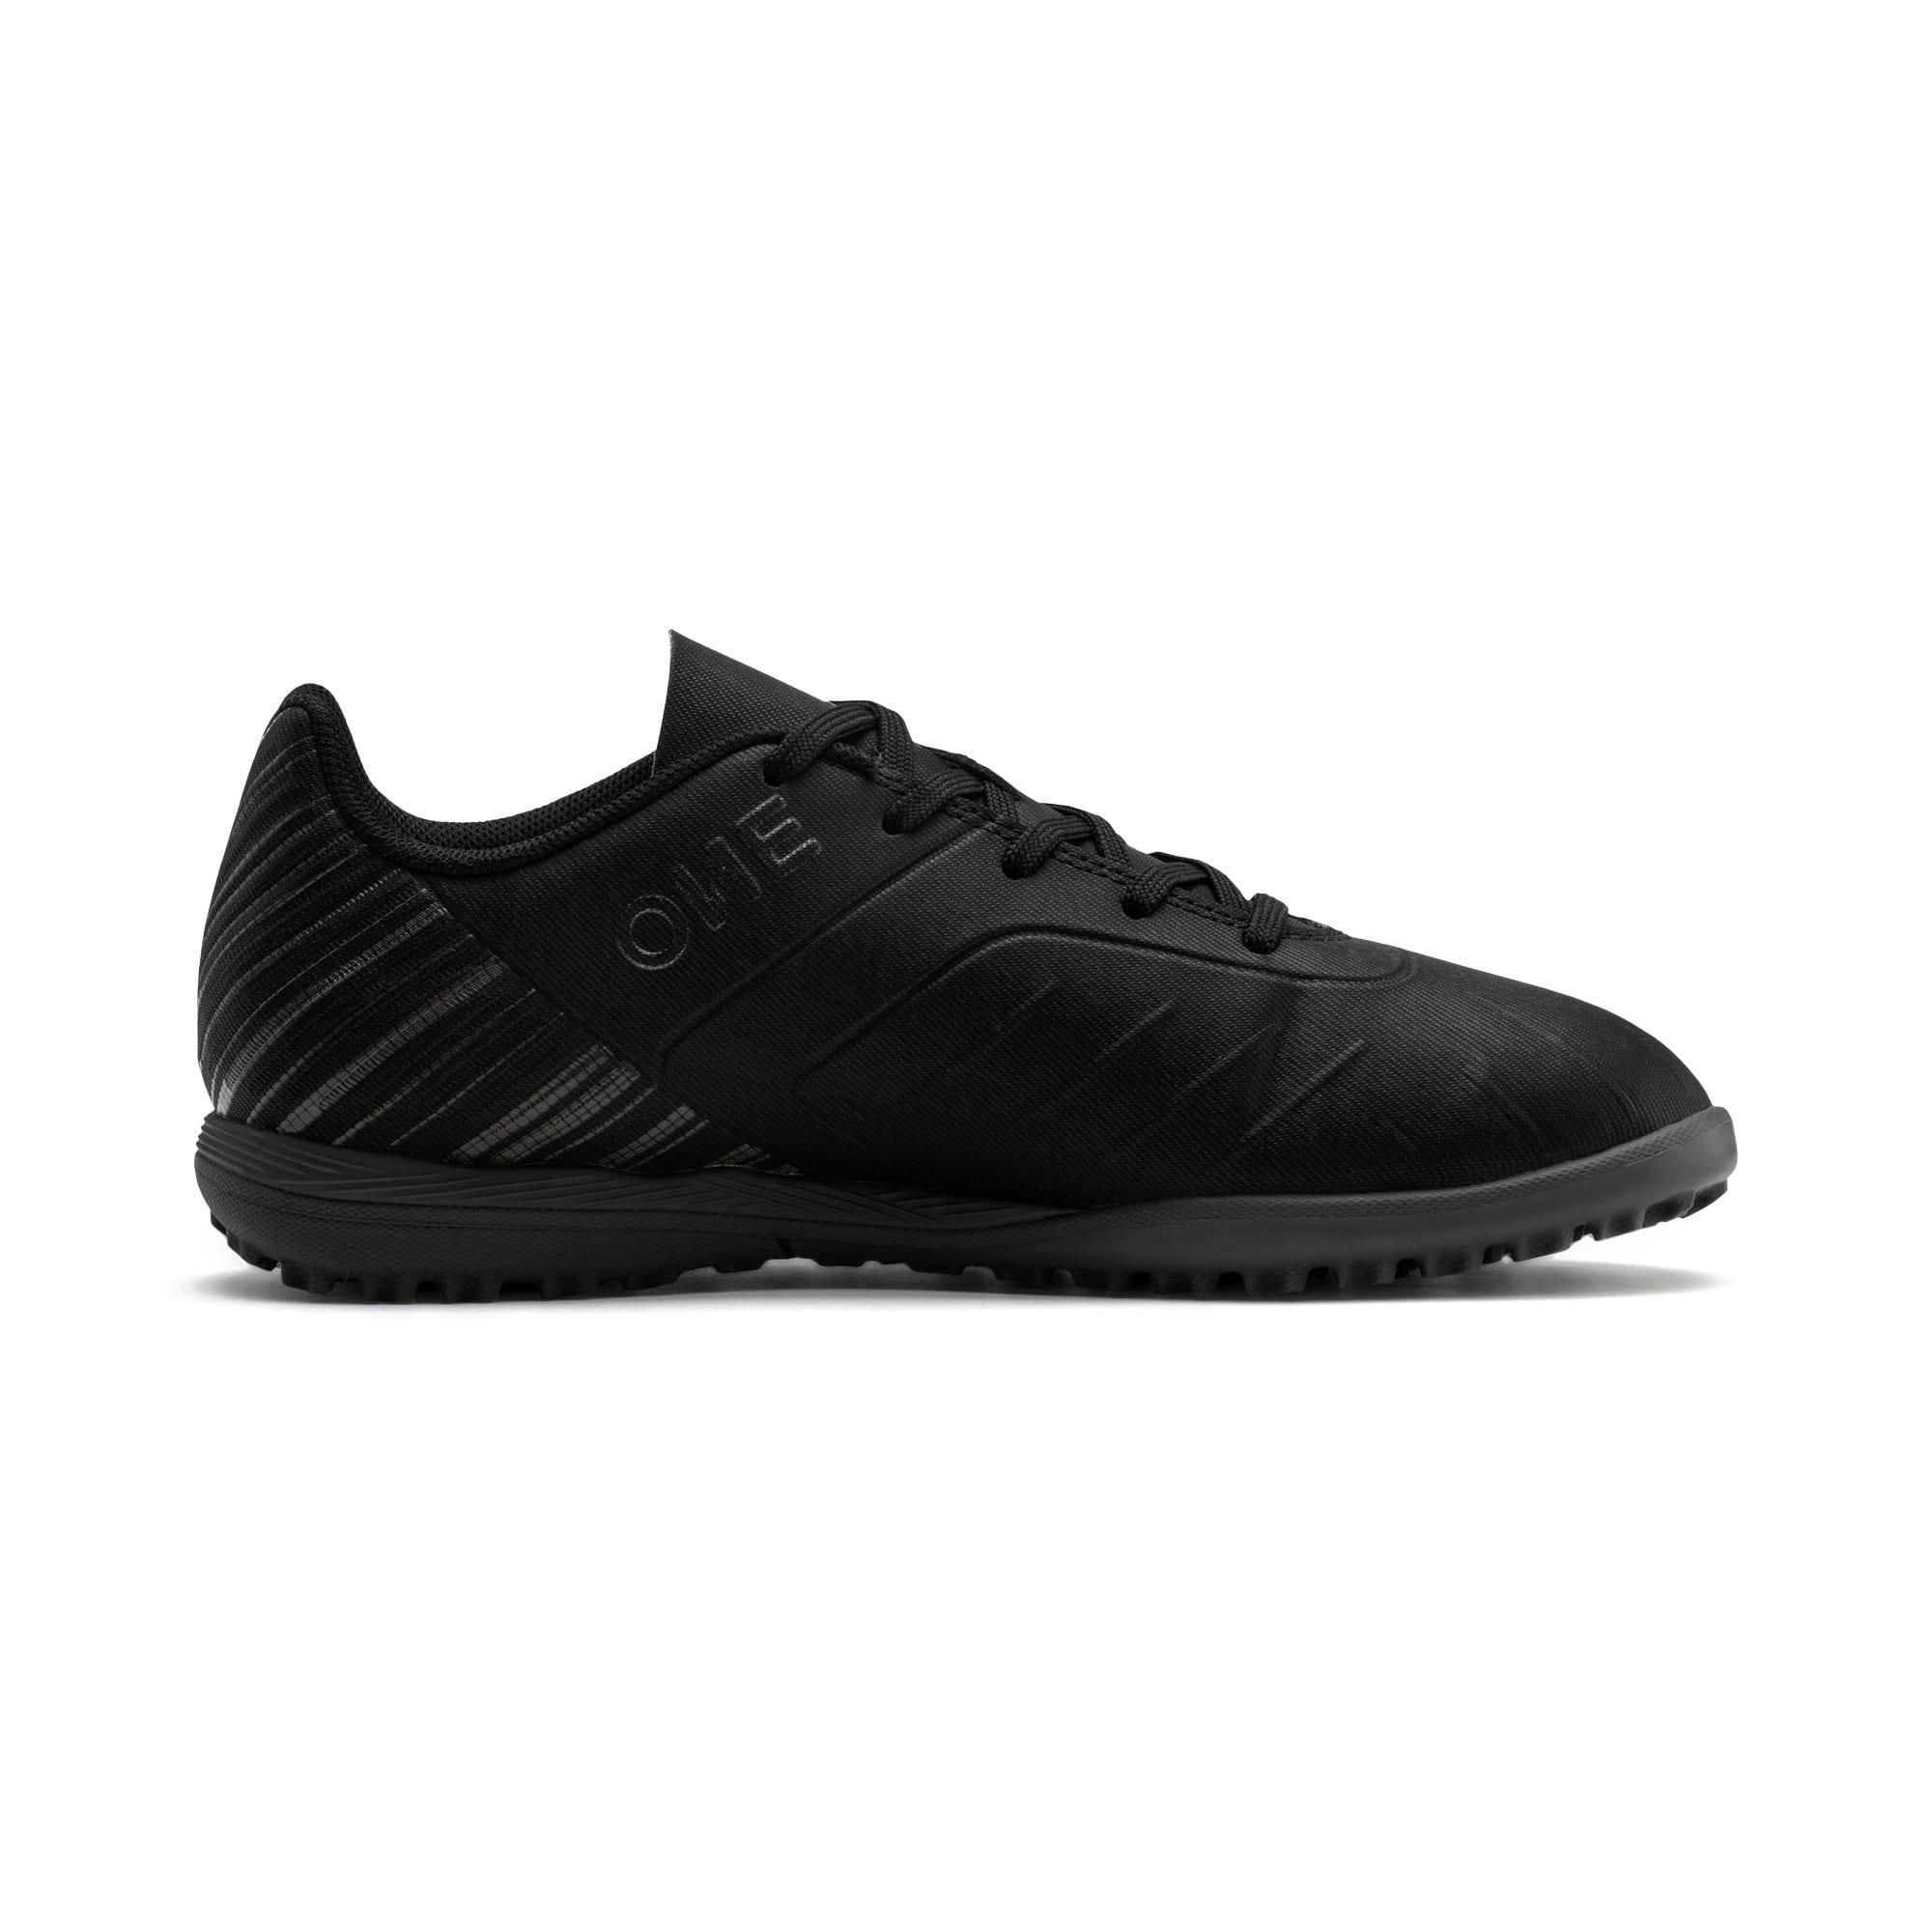 Thumbnail 5 of PUMA ONE 5.4 TT Soccer Shoes JR, Black-Black-Puma Aged Silver, medium